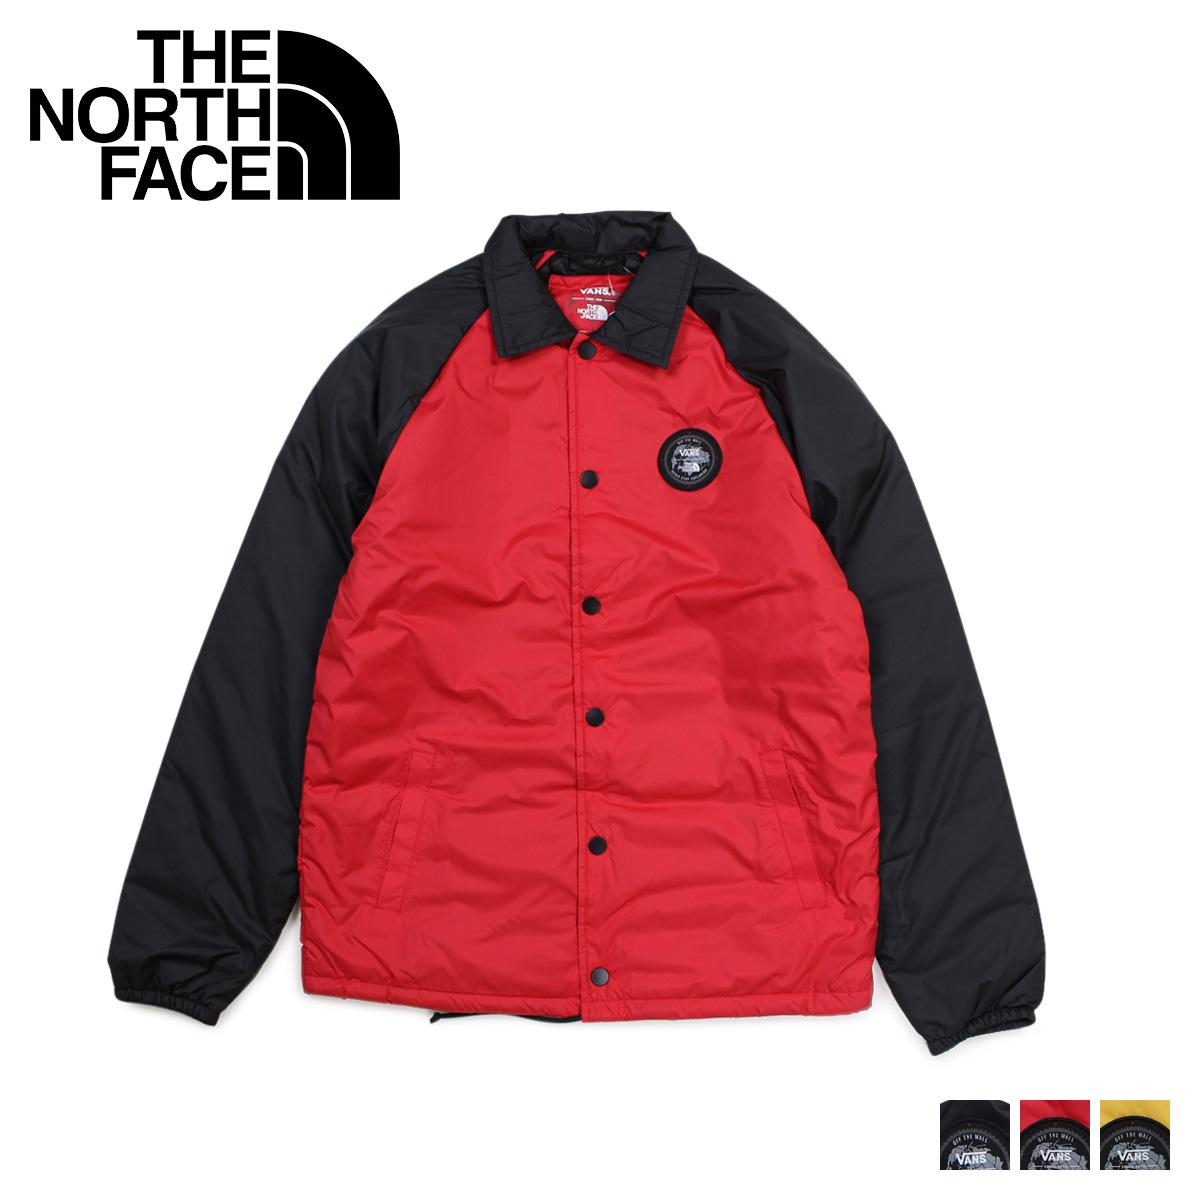 00603c875 THE NORTH FACE VANS TORREY MTE JACKET North Face vans jacket coach jacket  men station wagons black [11/20 Shinnyu load] [1711]